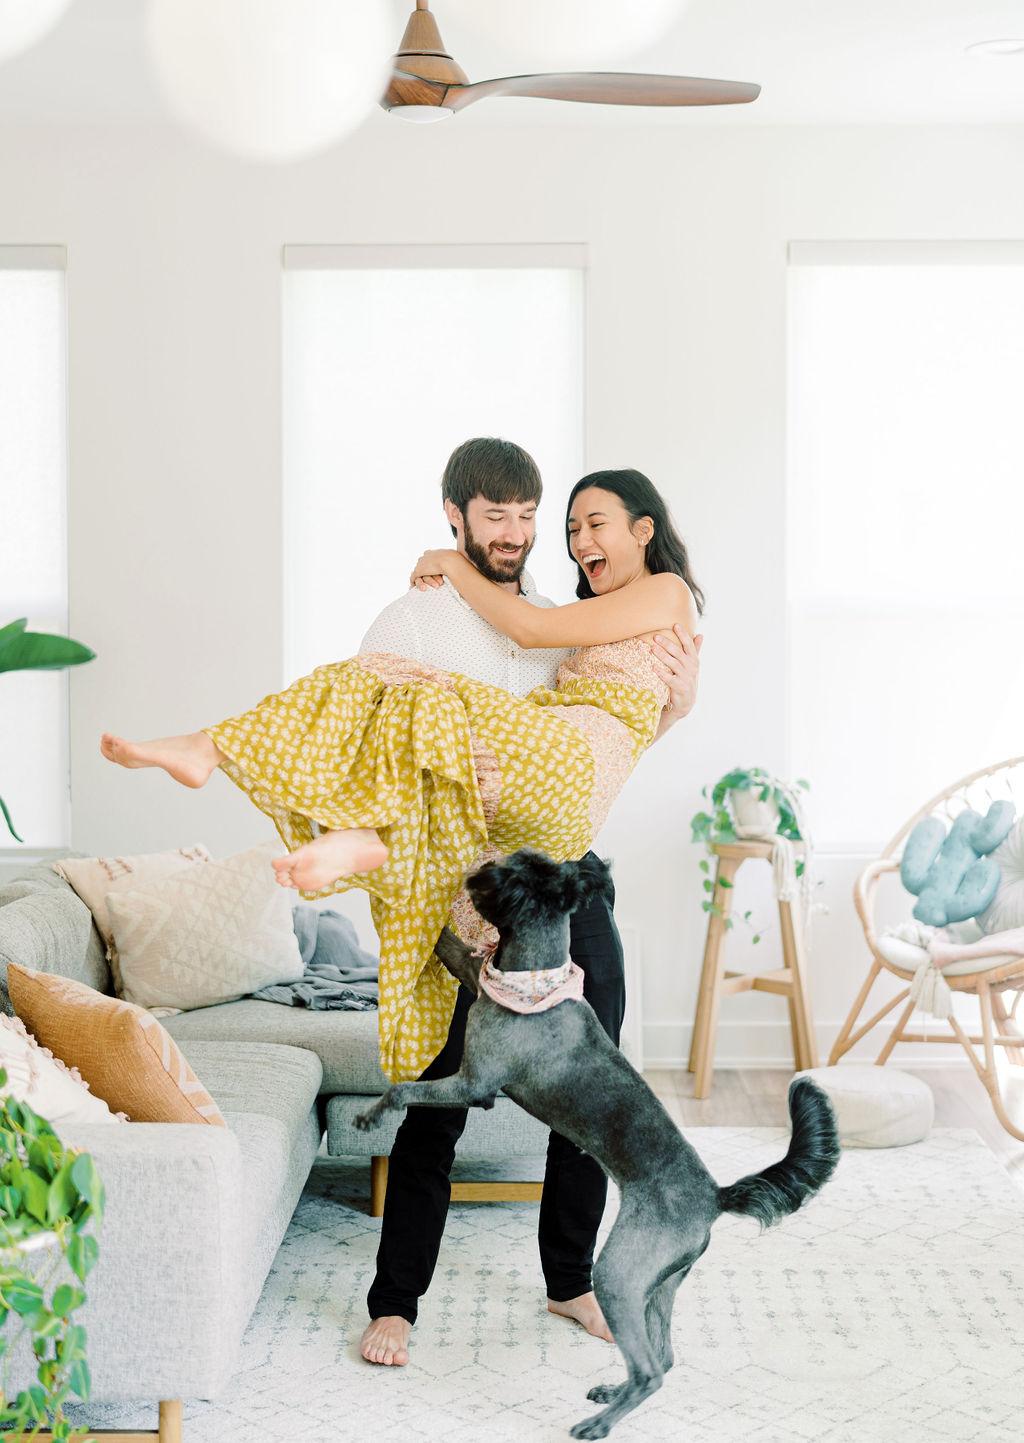 Austin-Intimate-Wedding-Elopement-Photograper-Film-Downtown-Engagement-Session-Home-62.jpg